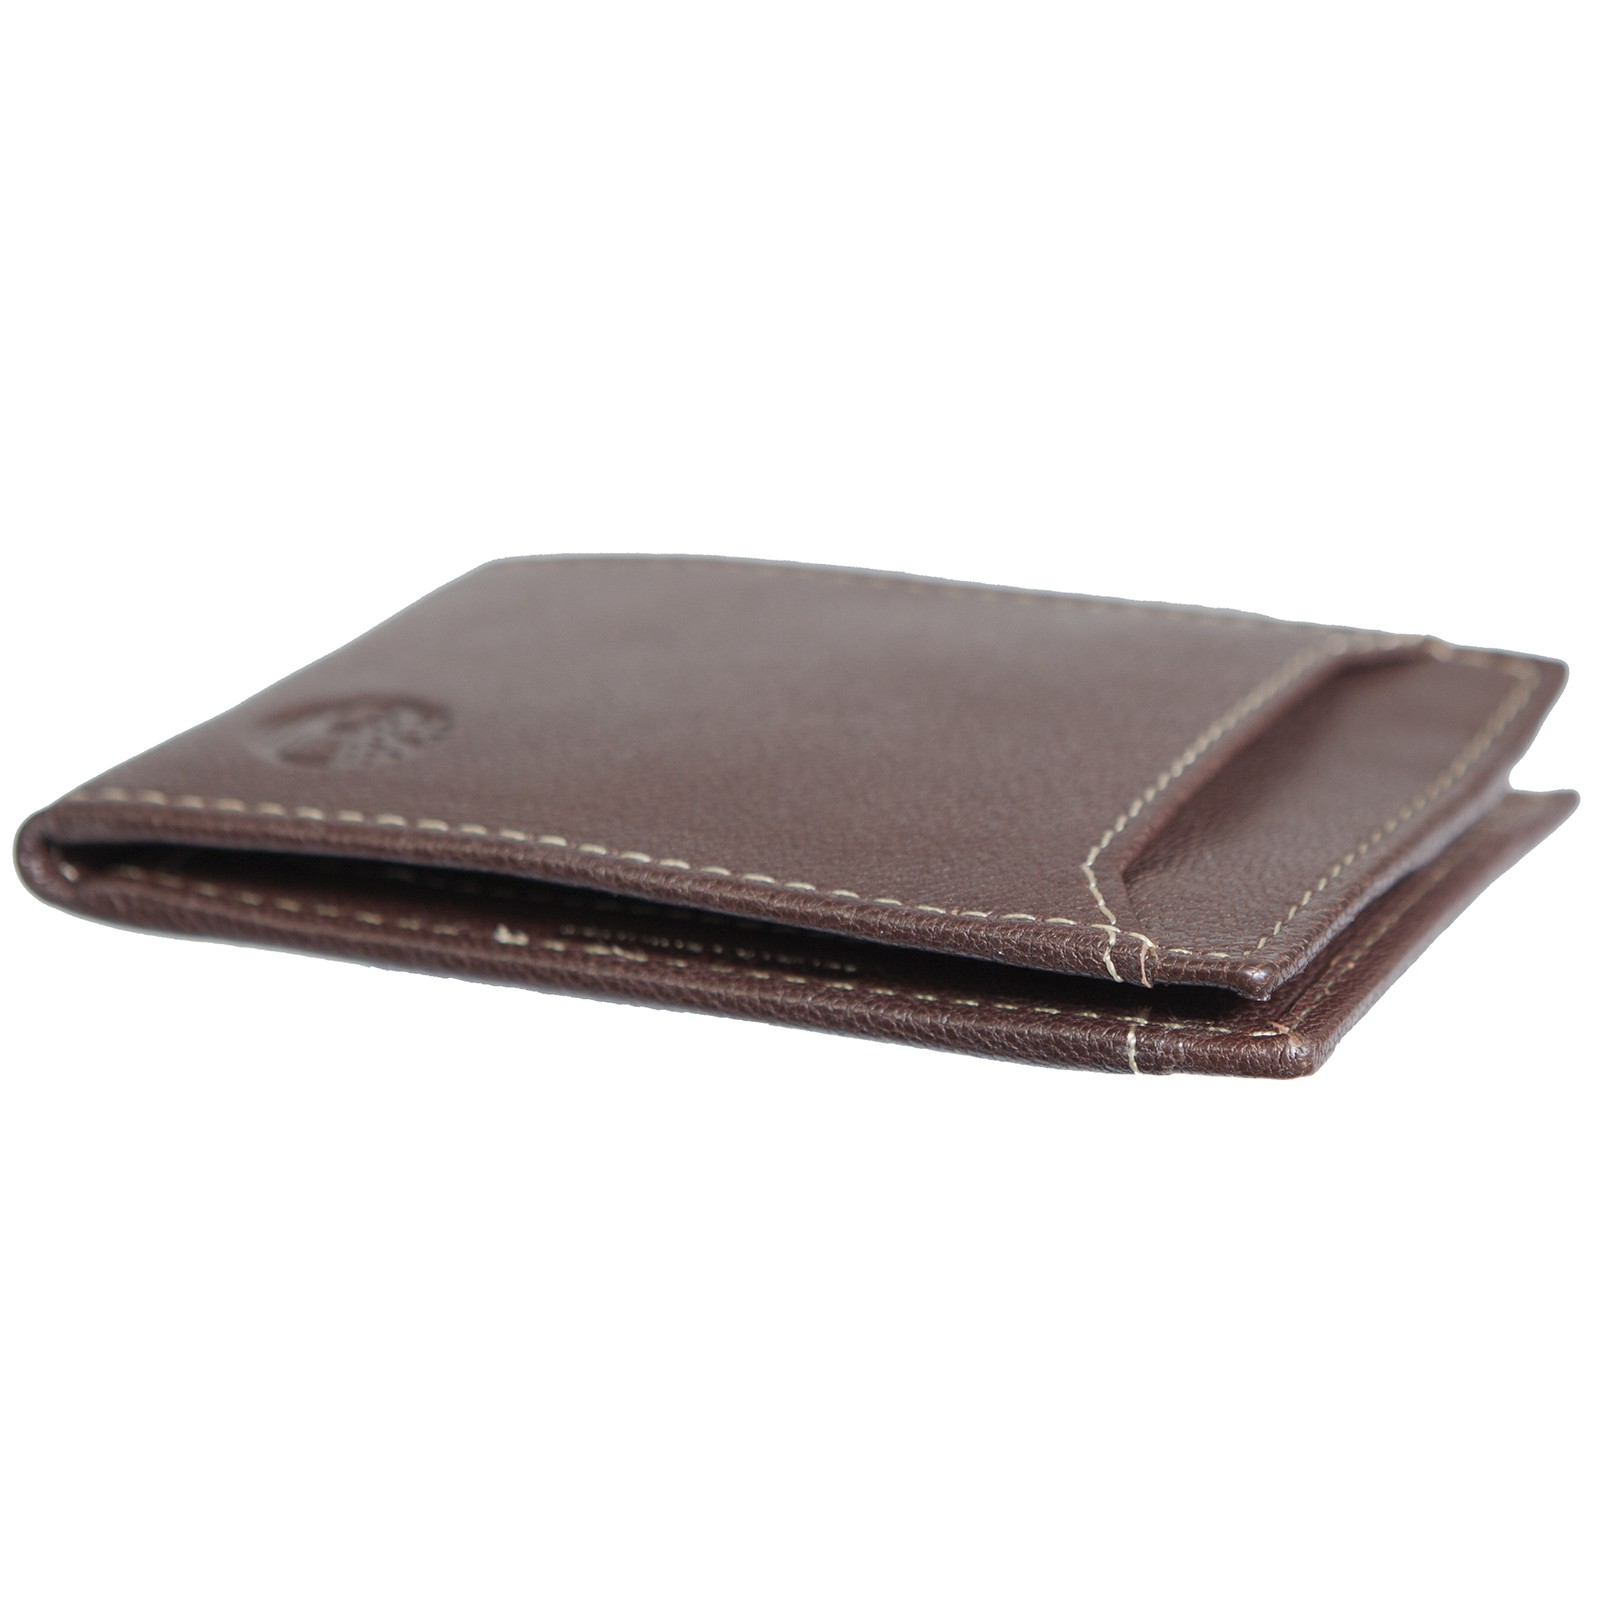 Timberland Mens Flip Money Clip Leather Bifold ID Card Case Holder Pocket Wallet